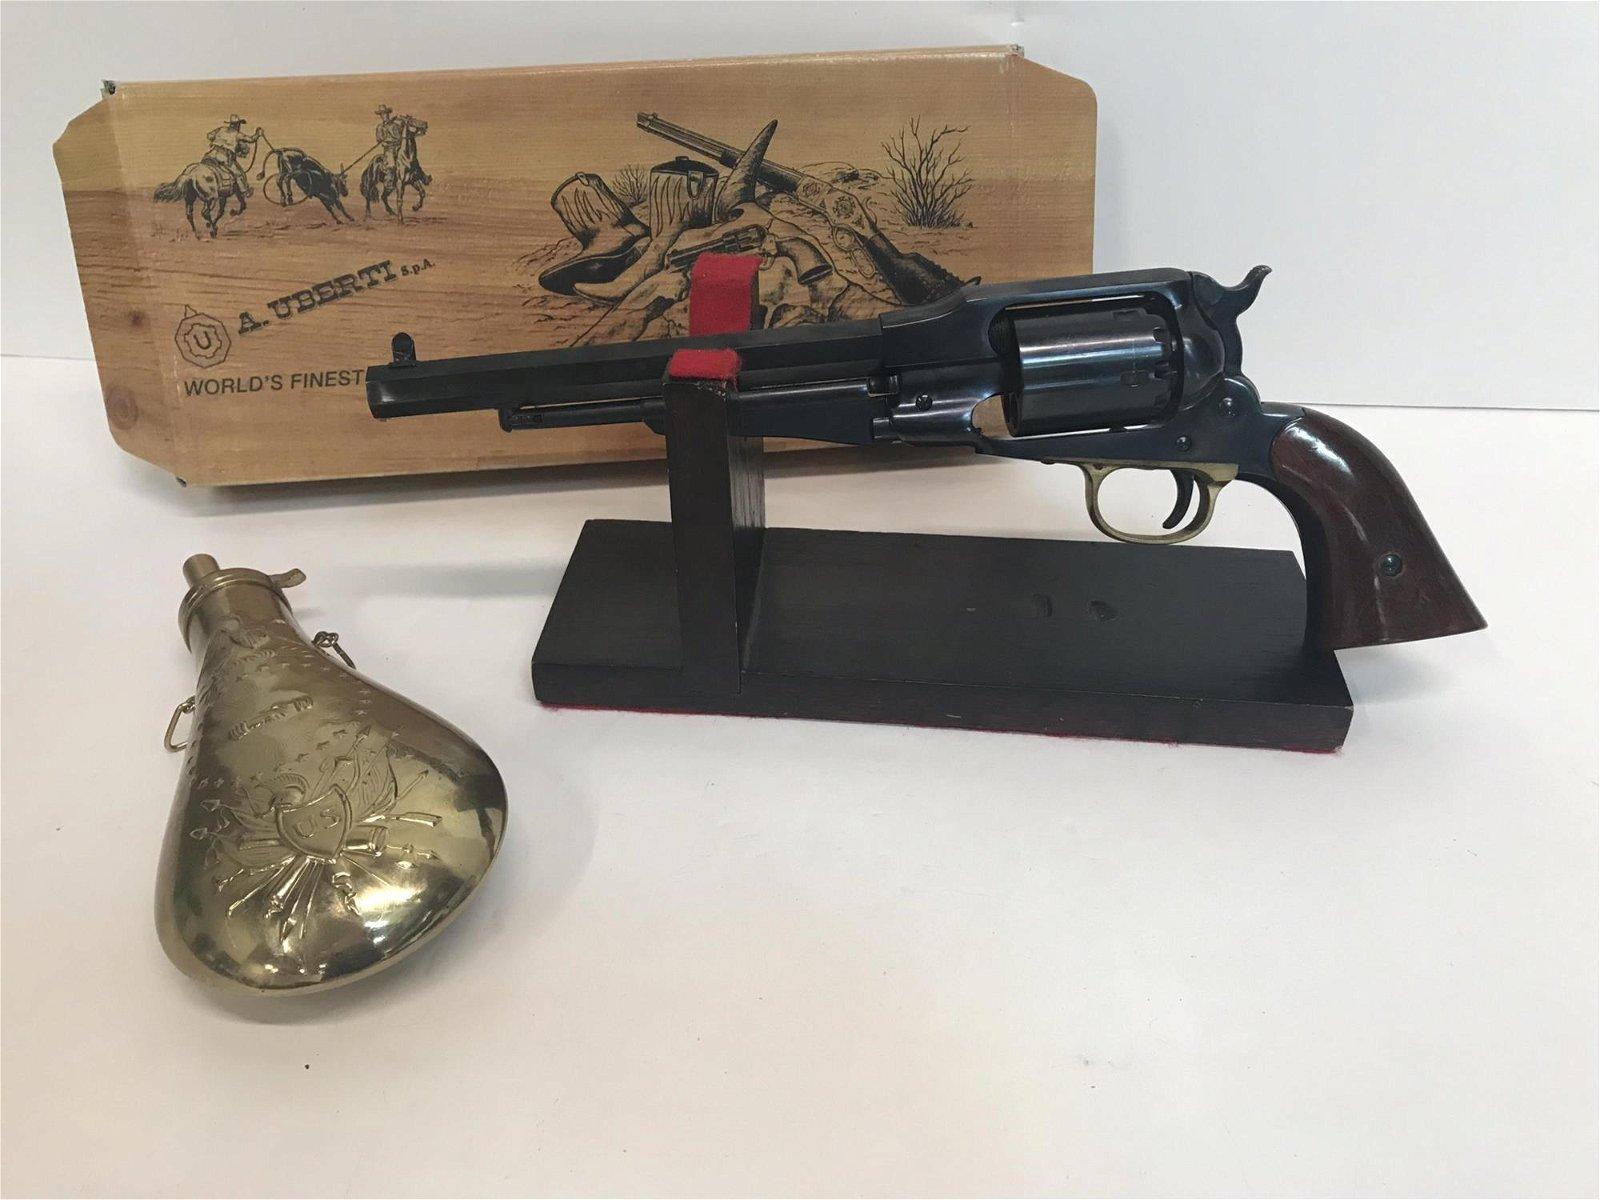 A. UBERTI 1858 NEW IMPR. ARM REPLICA